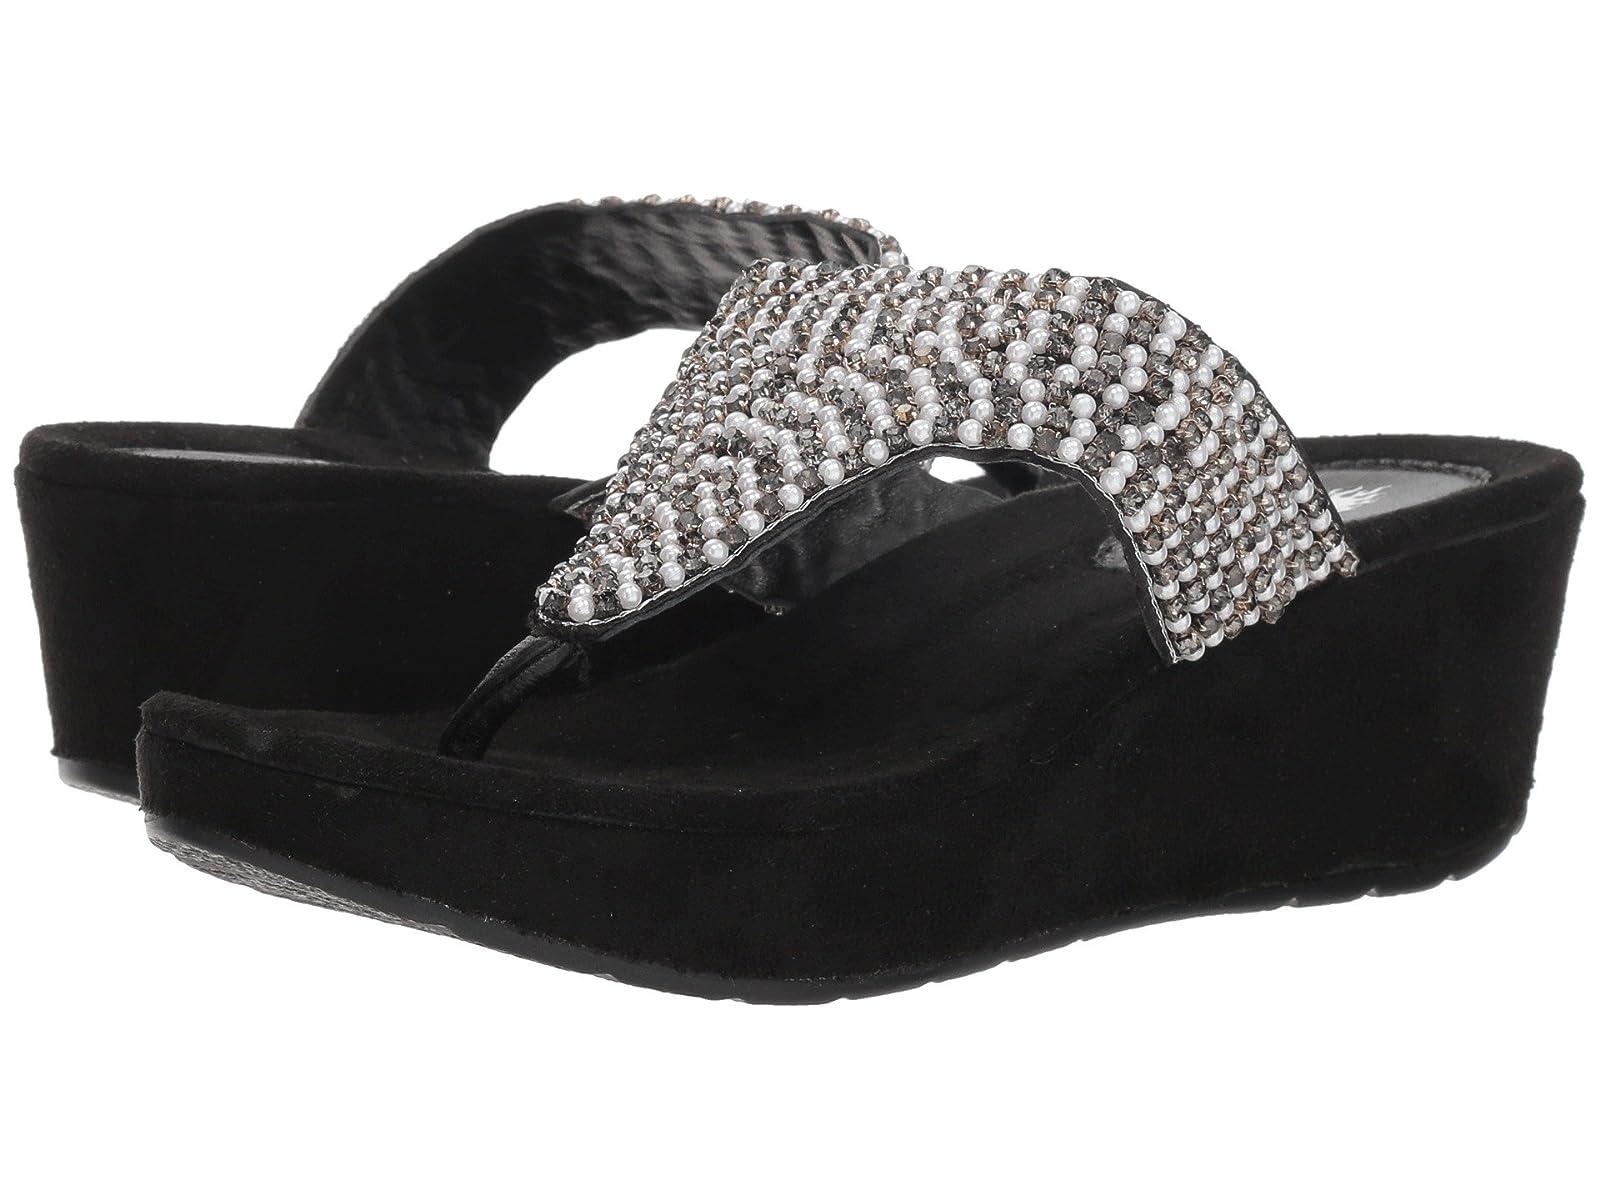 VOLATILE AffectionAtmospheric grades have affordable shoes